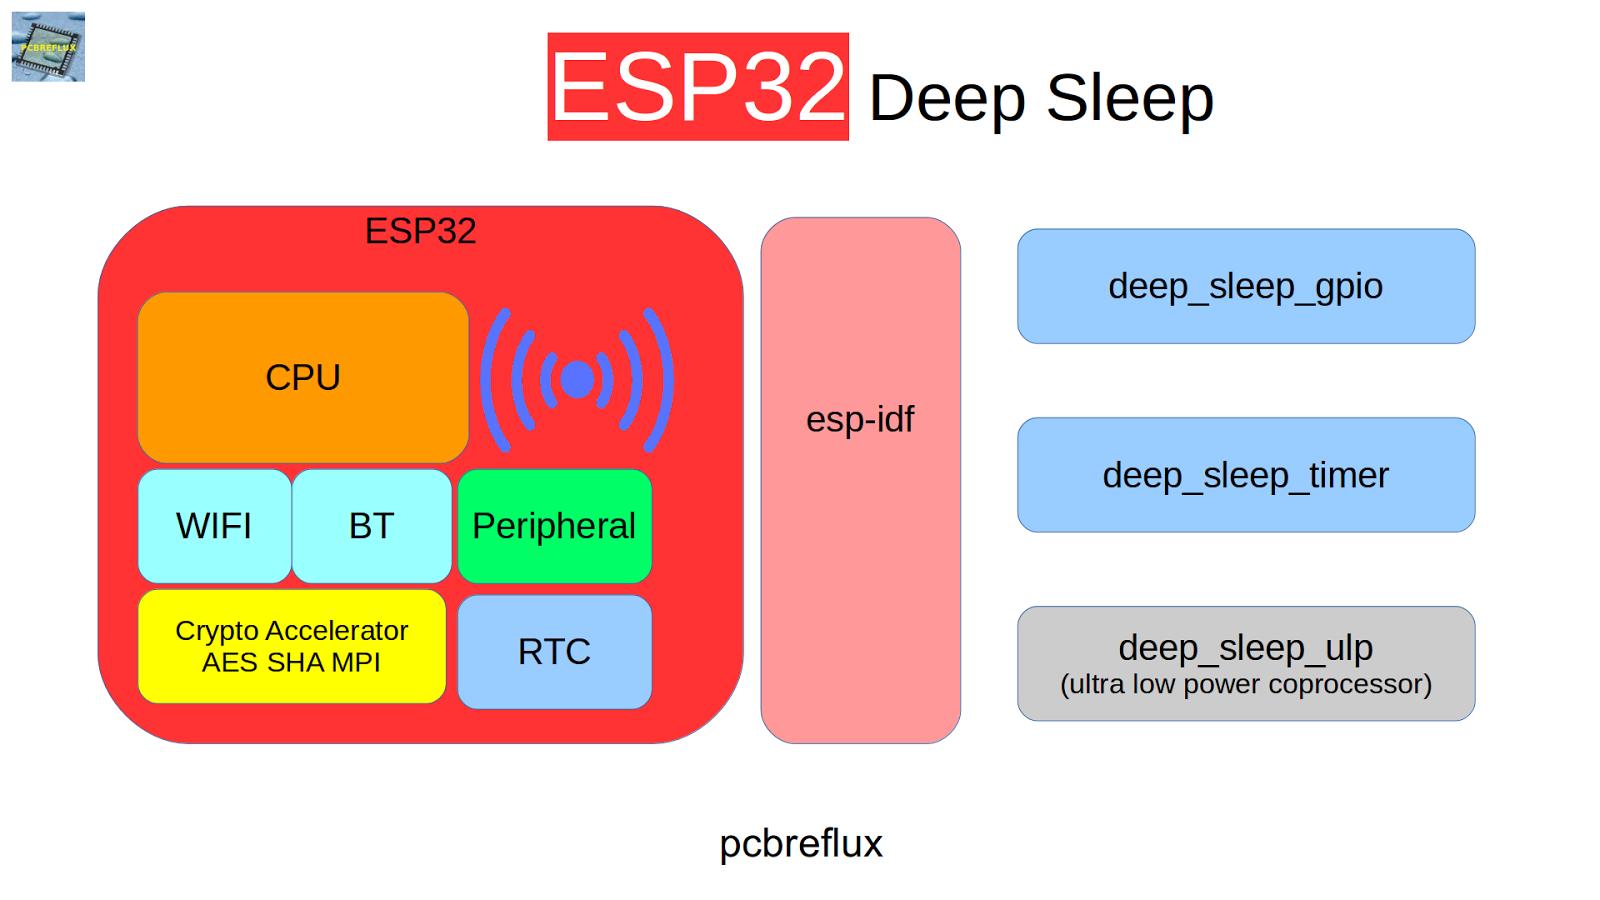 pcbreflux: ESP32 Deep Sleep Example